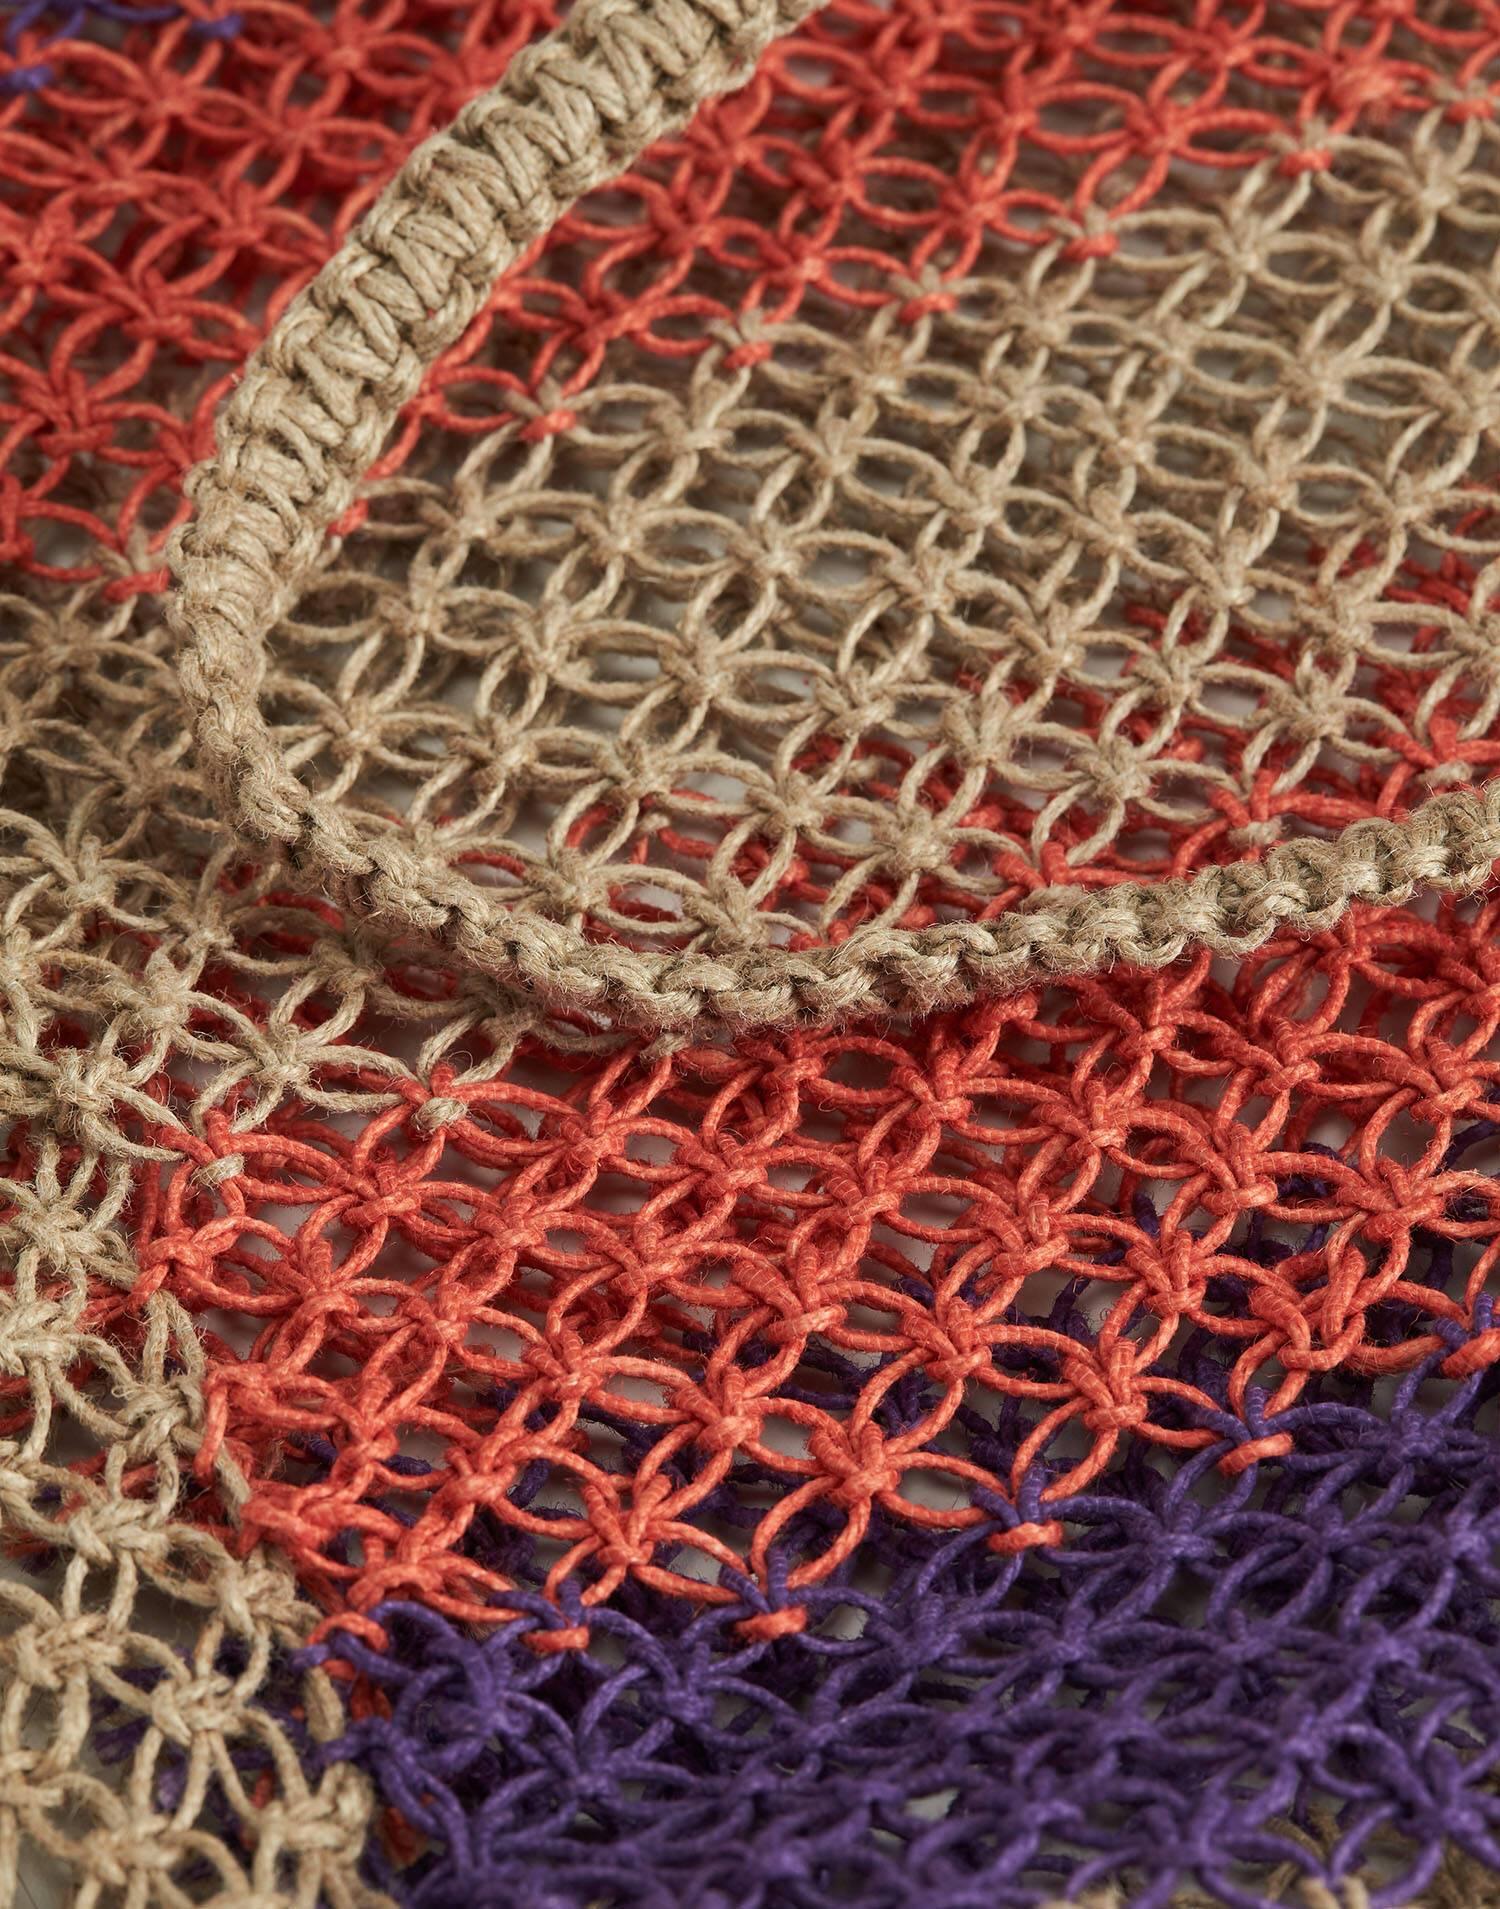 Multicolor striped jute bag